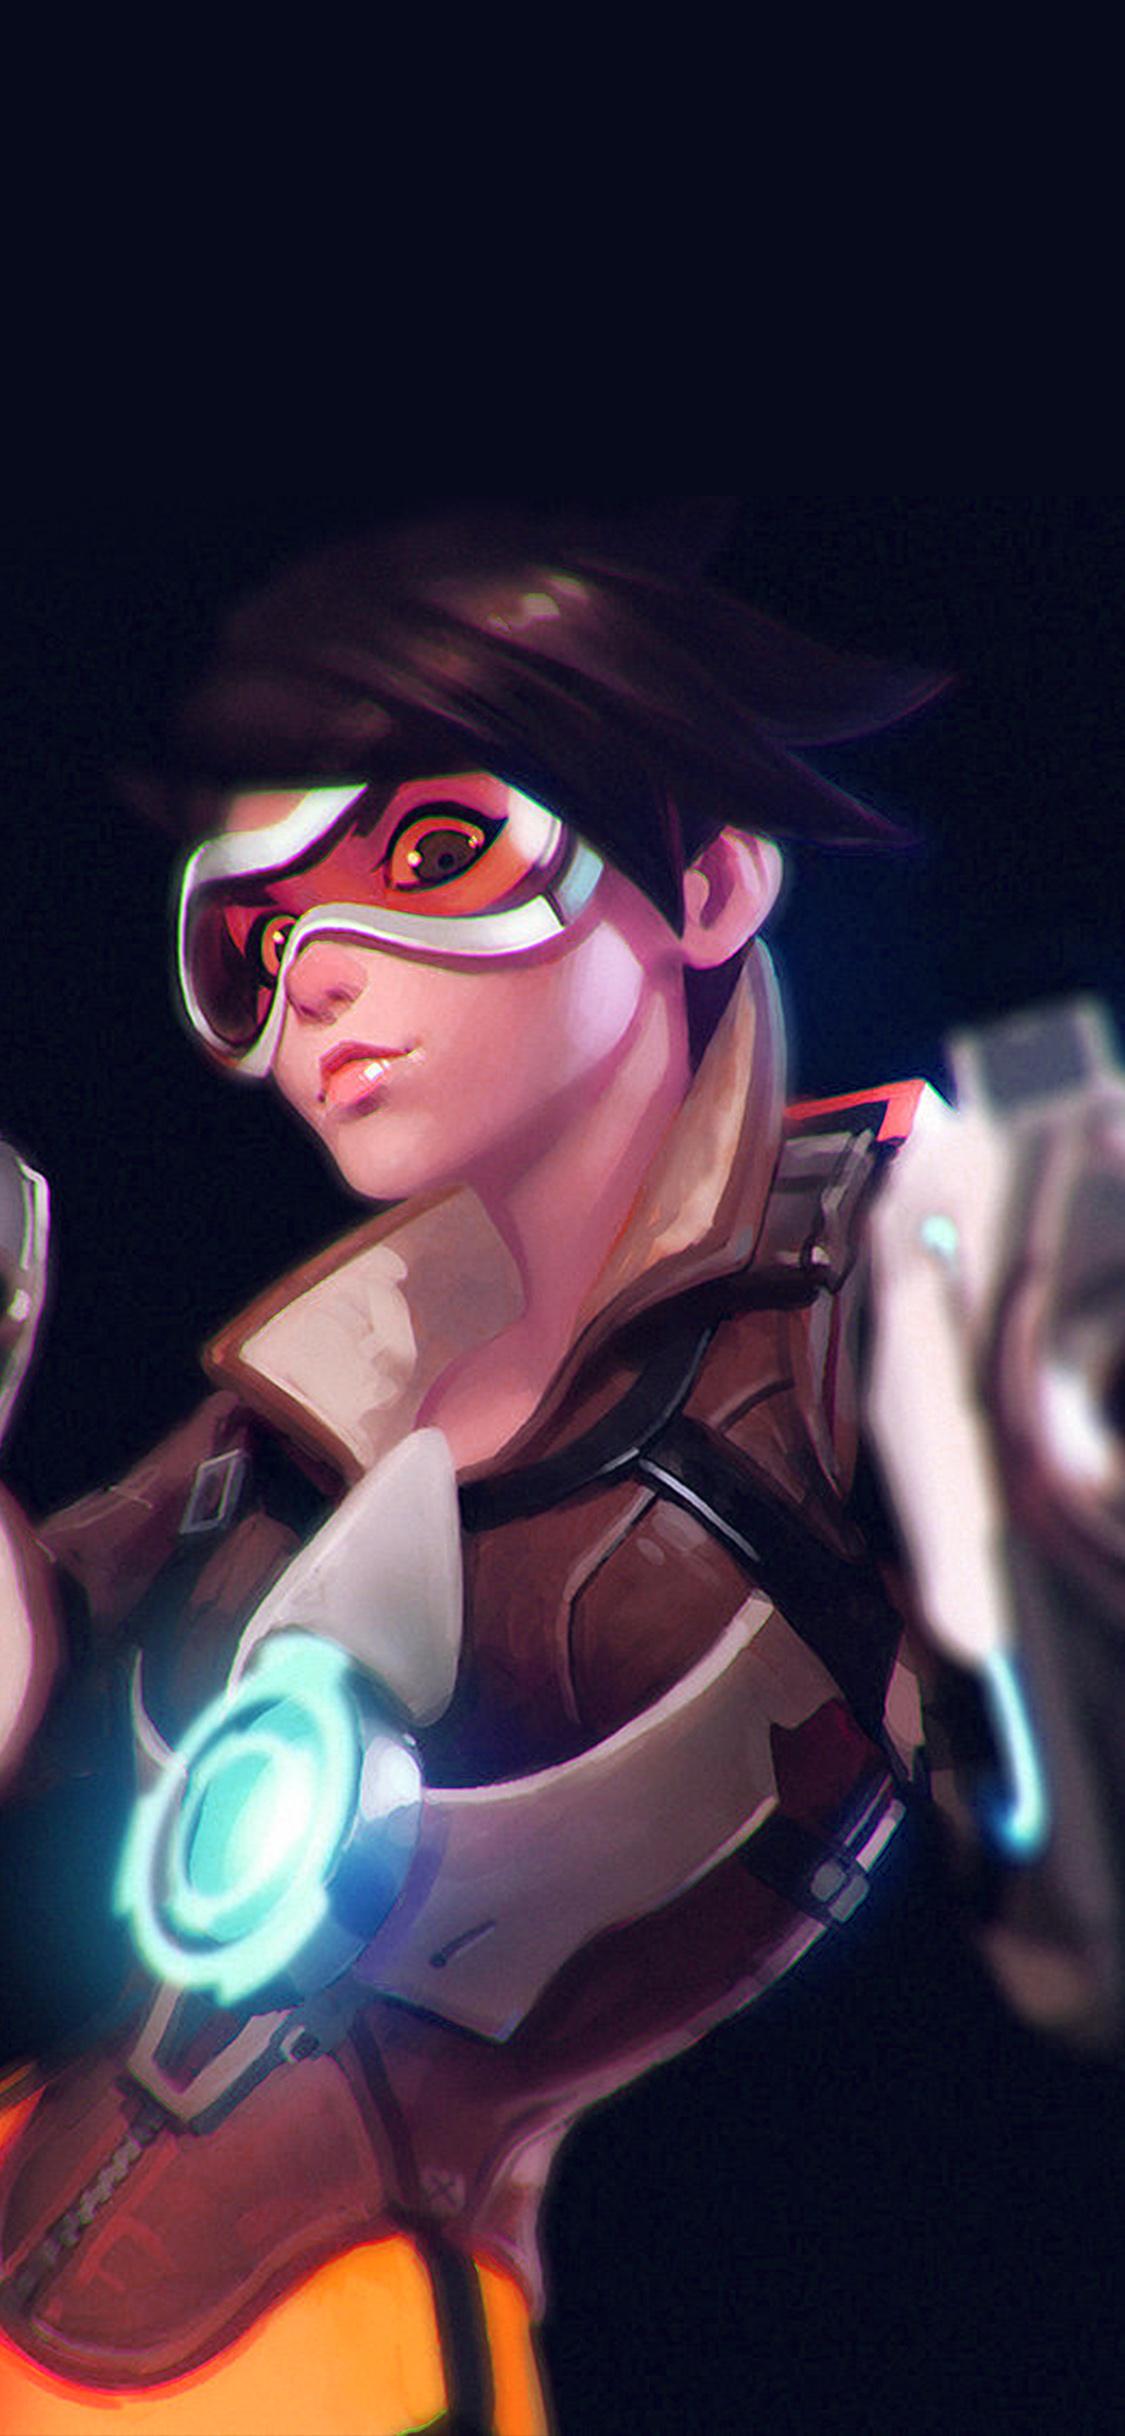 iPhonexpapers.com-Apple-iPhone-wallpaper-ay36-ilya-kuvshinov-overwatch-tracer-hero-game-illustration-art-blue